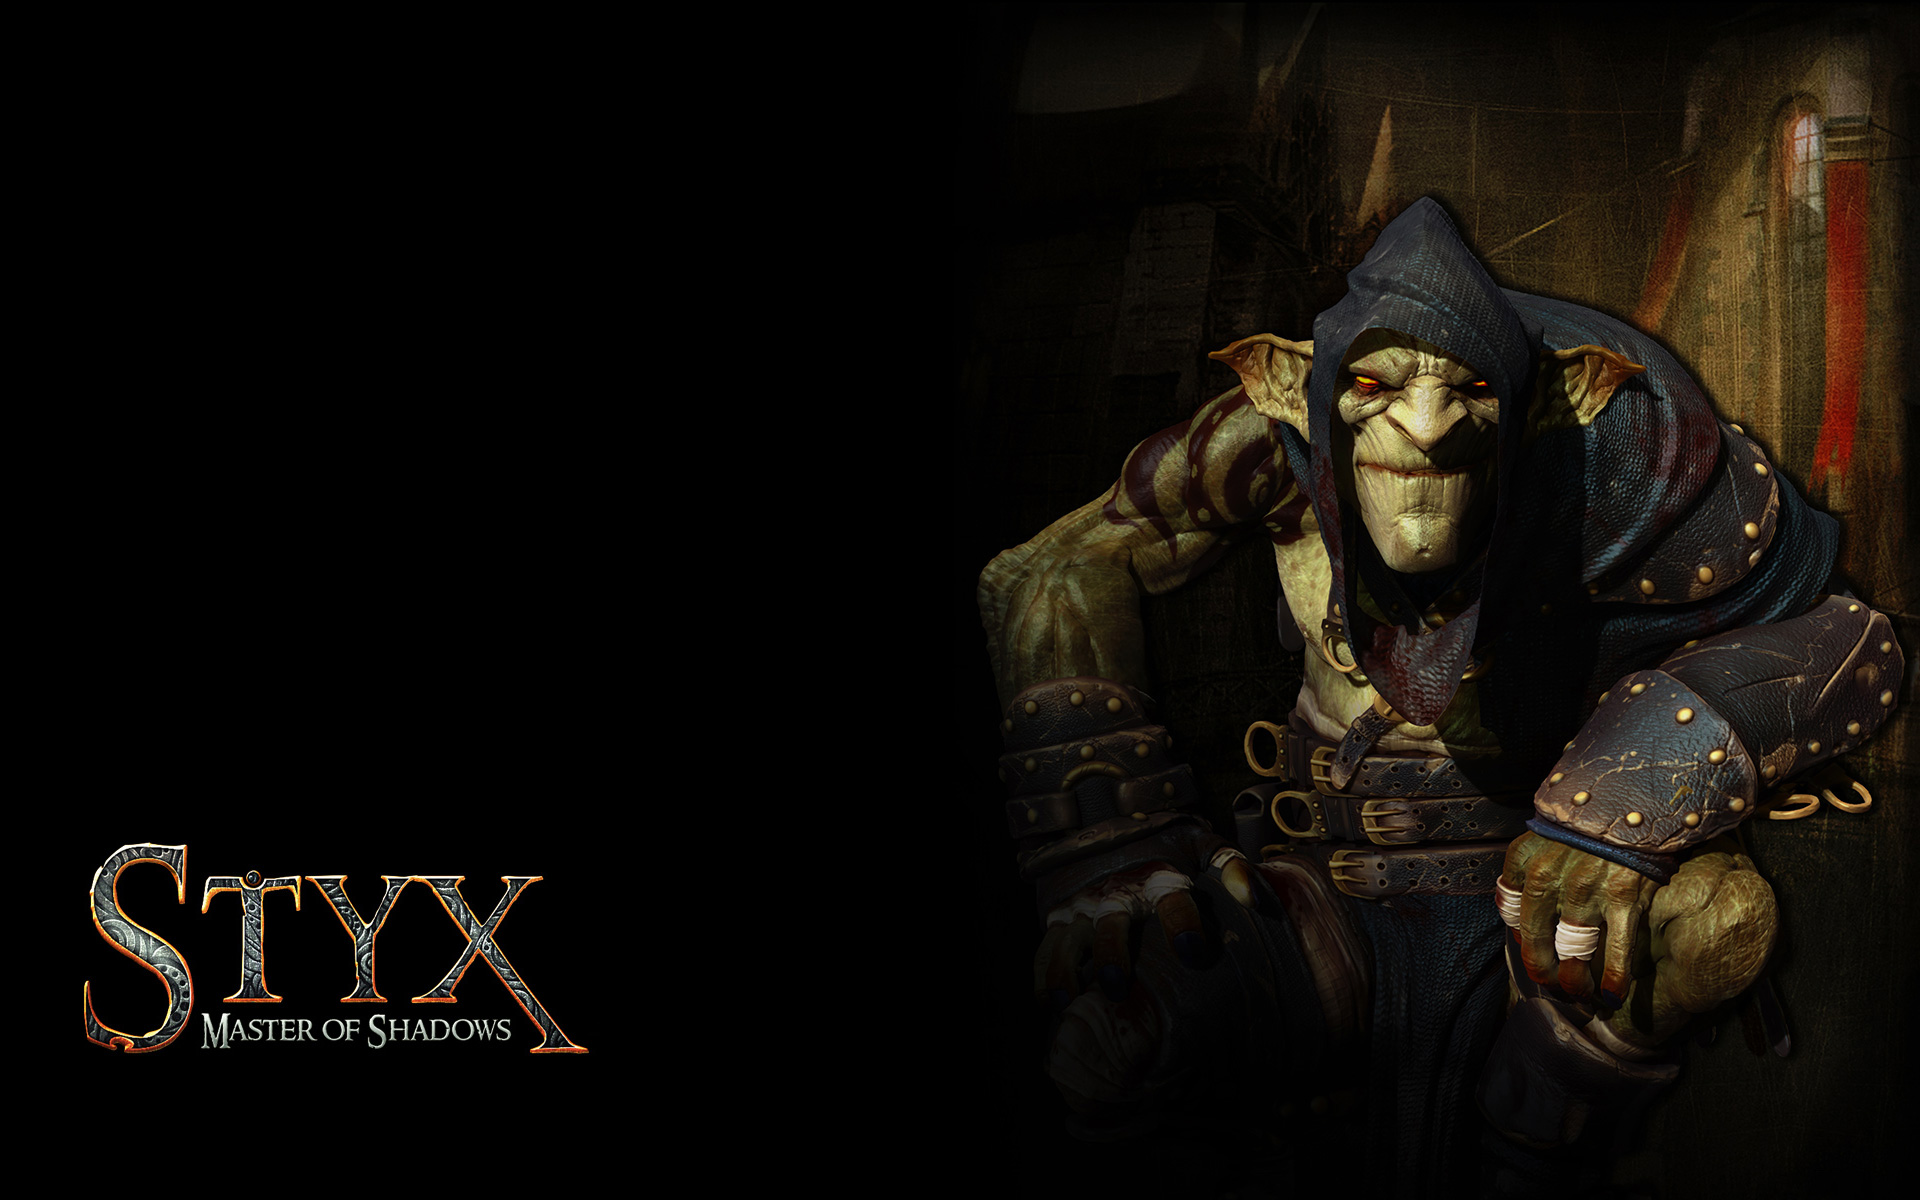 Styx Master of Shadows Wallpaper in 1920x1200 1920x1200